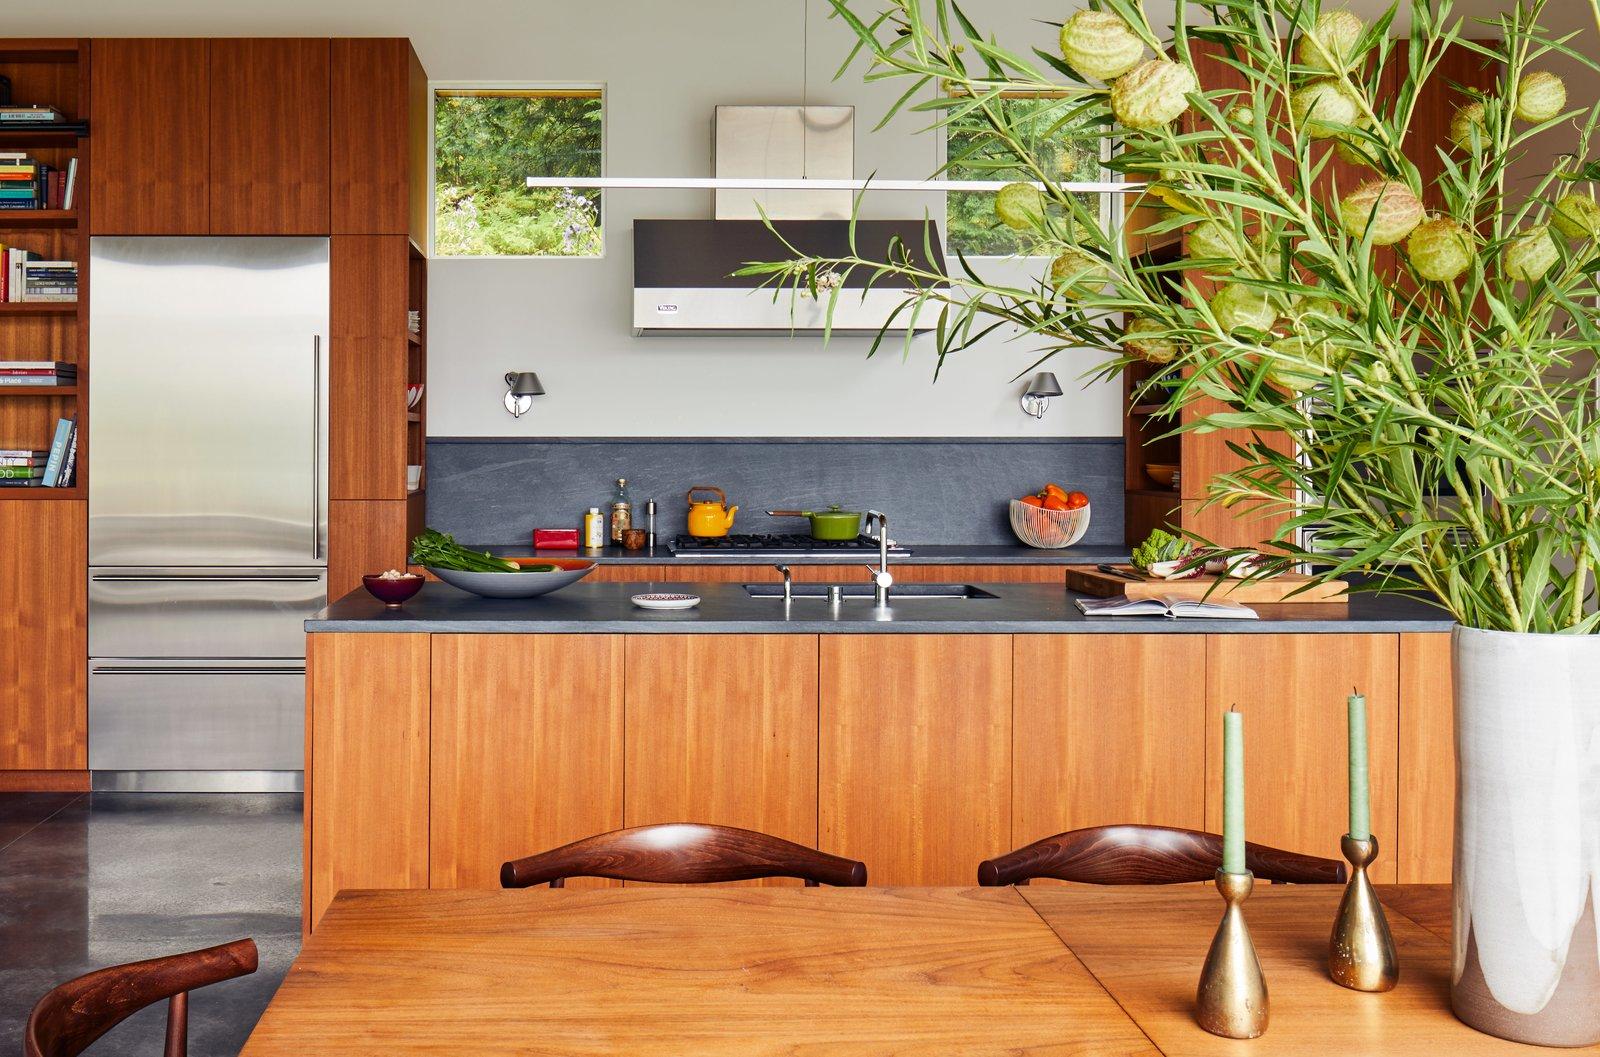 Mount Washington Residence kitchen